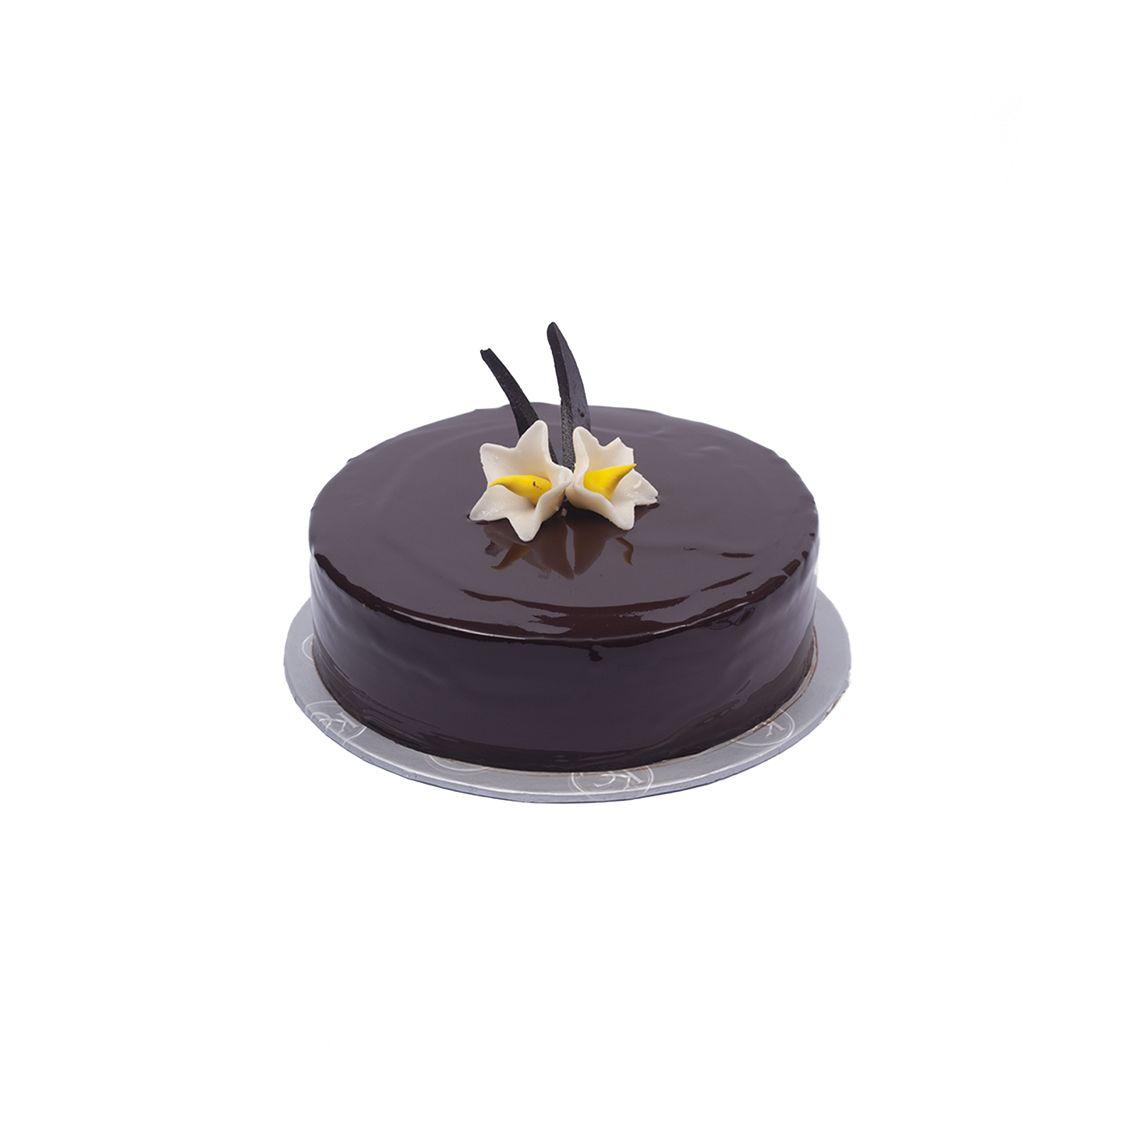 Kitchen Cuisine Default Category Chocolate Praline Crunch Cake